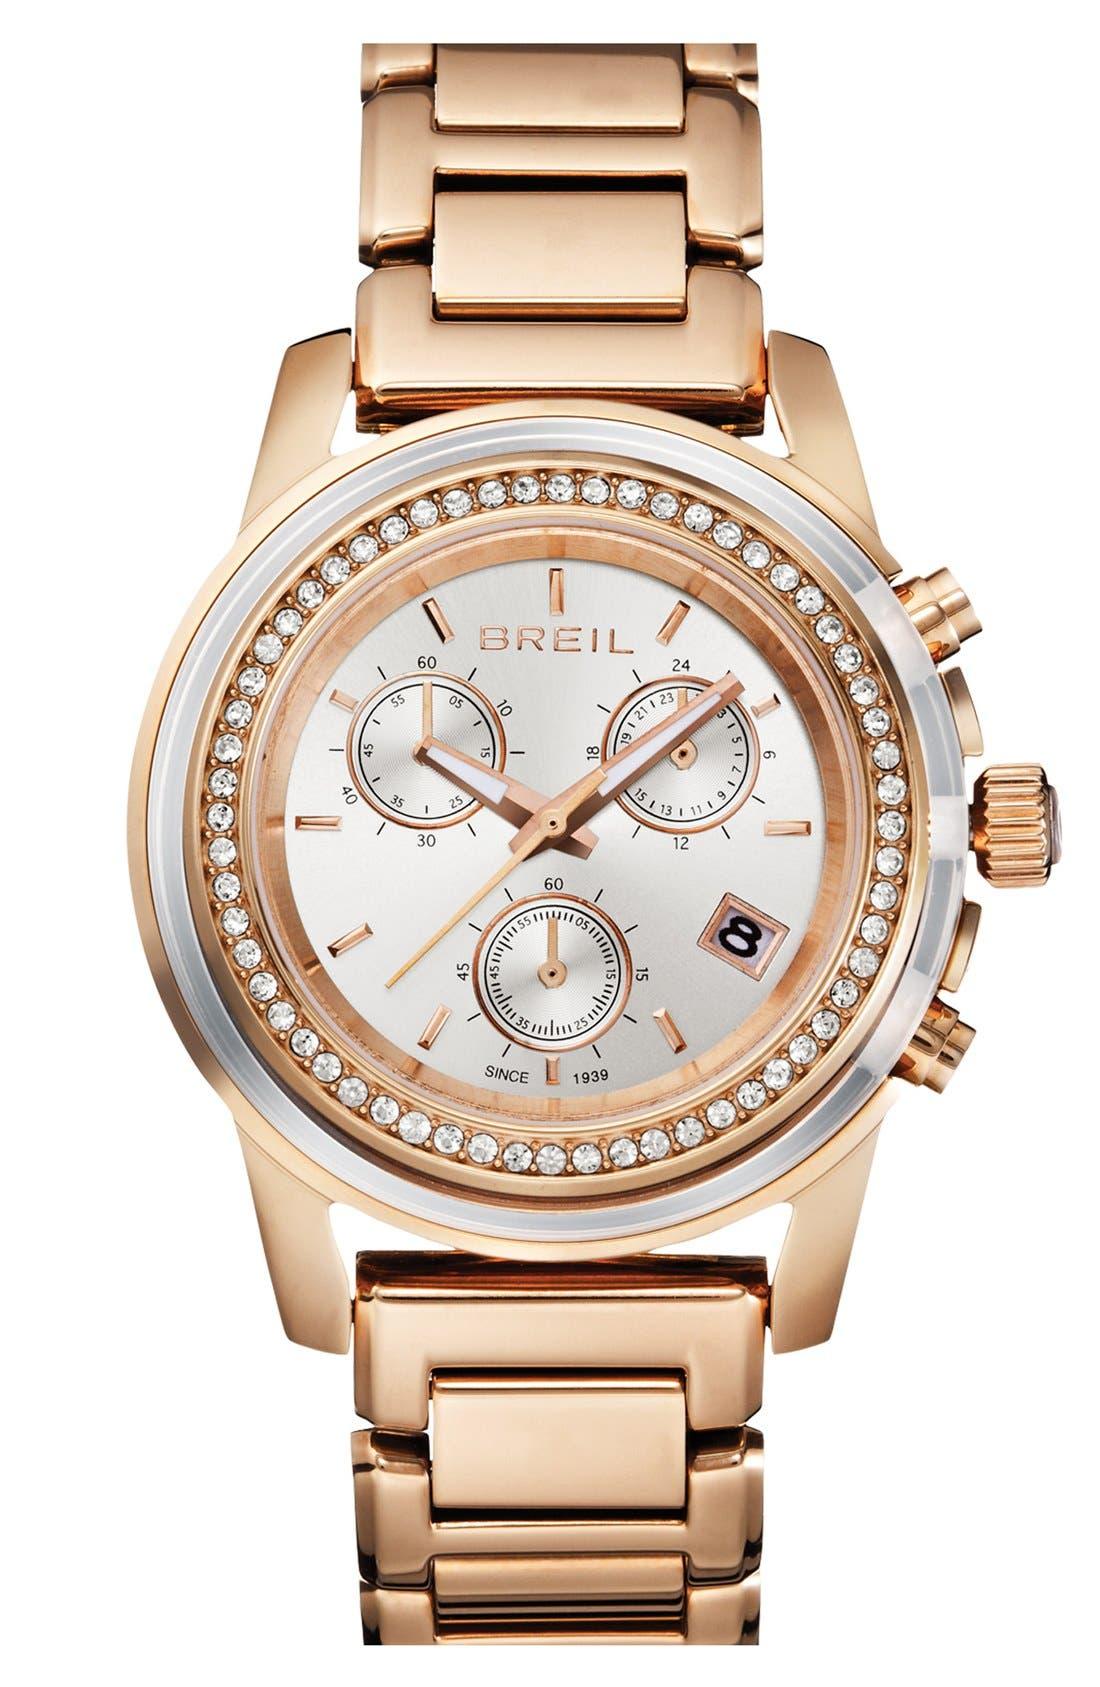 Main Image - Breil 'Orchestra' Crystal Bezel Chronograph Bracelet Watch, 37mm